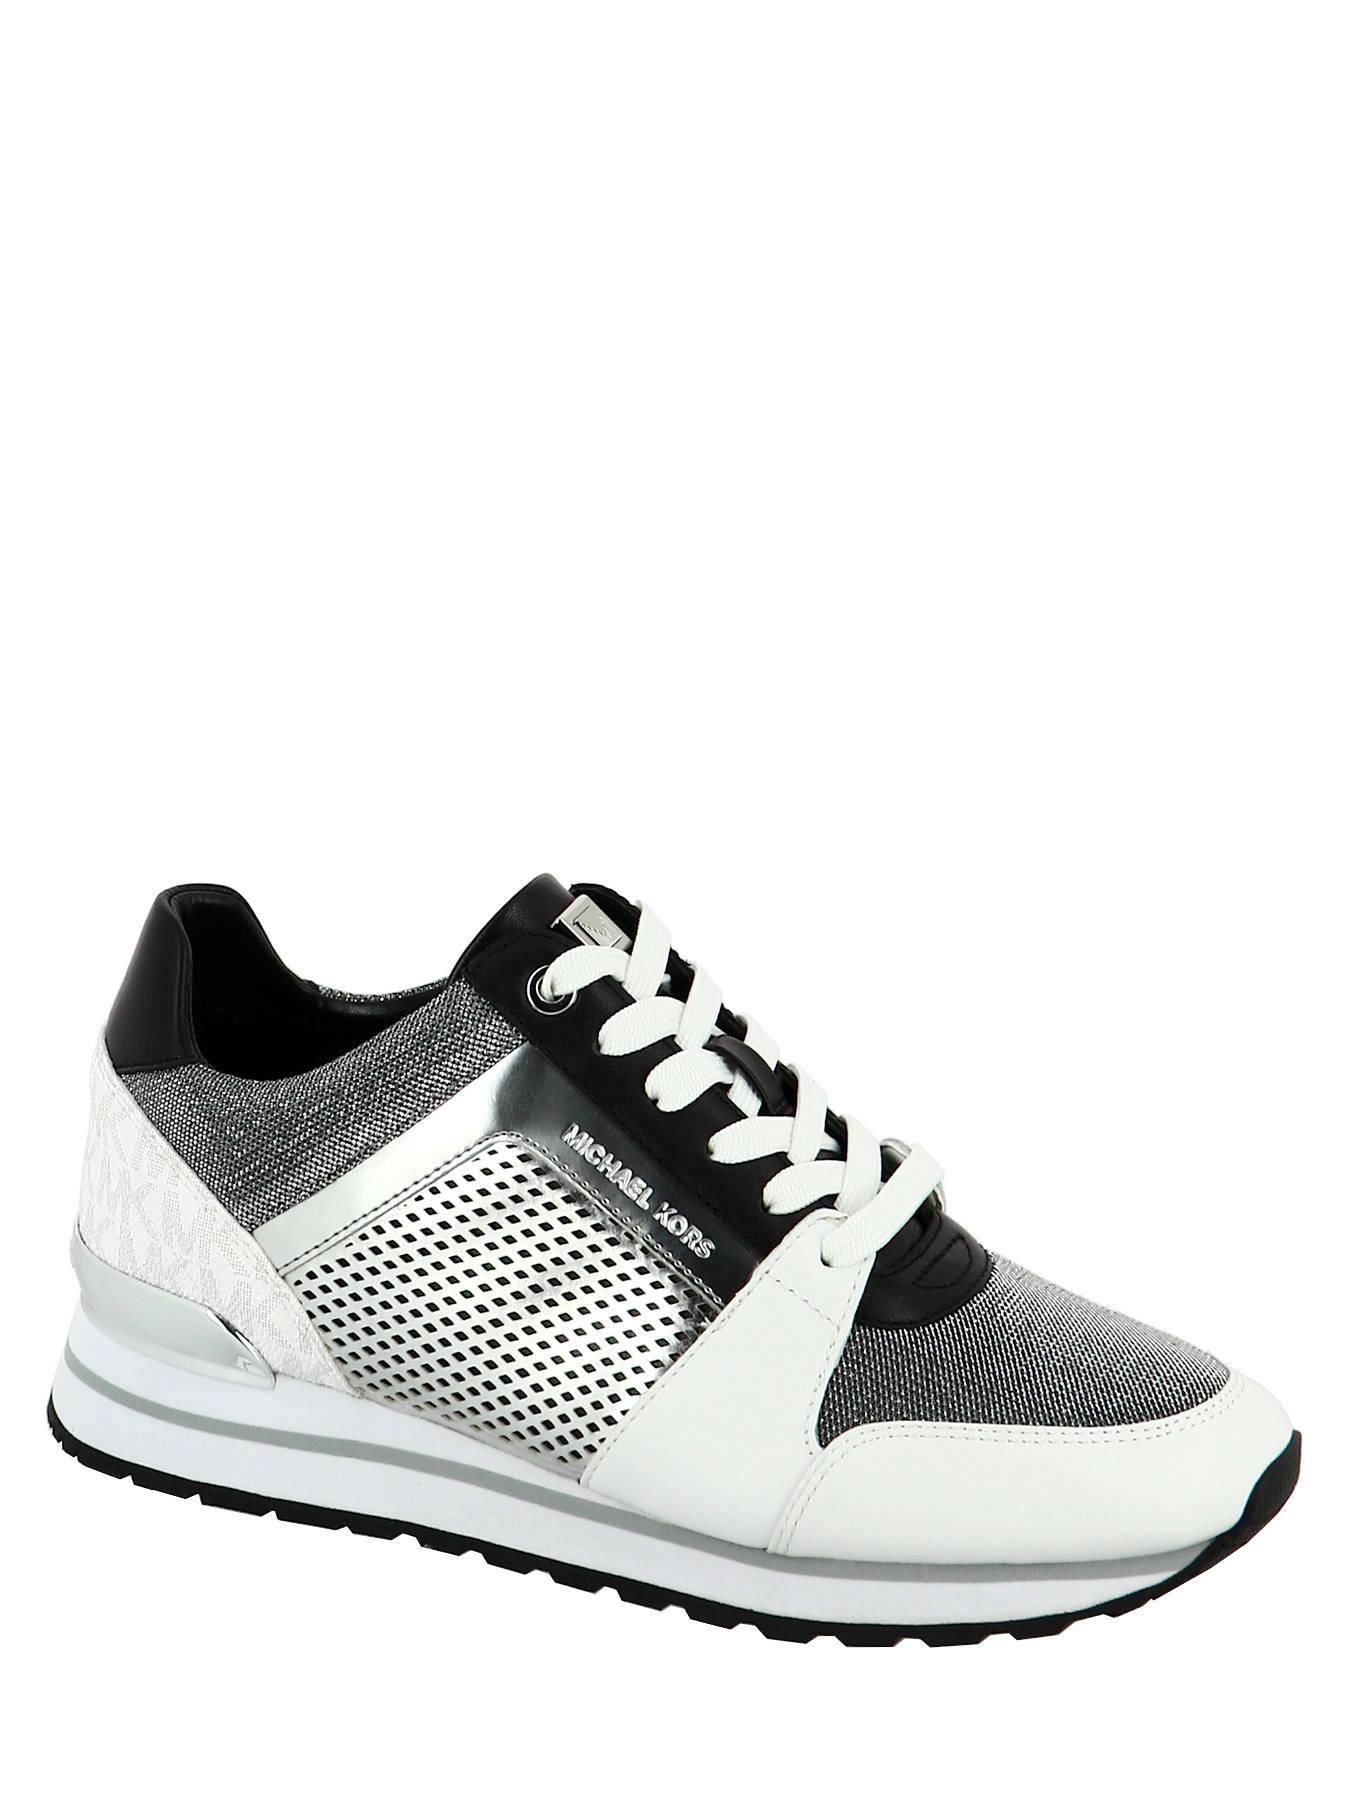 ec35dc8684633 Michael Kors Sneakers 43.R9BIFS1M - best prices